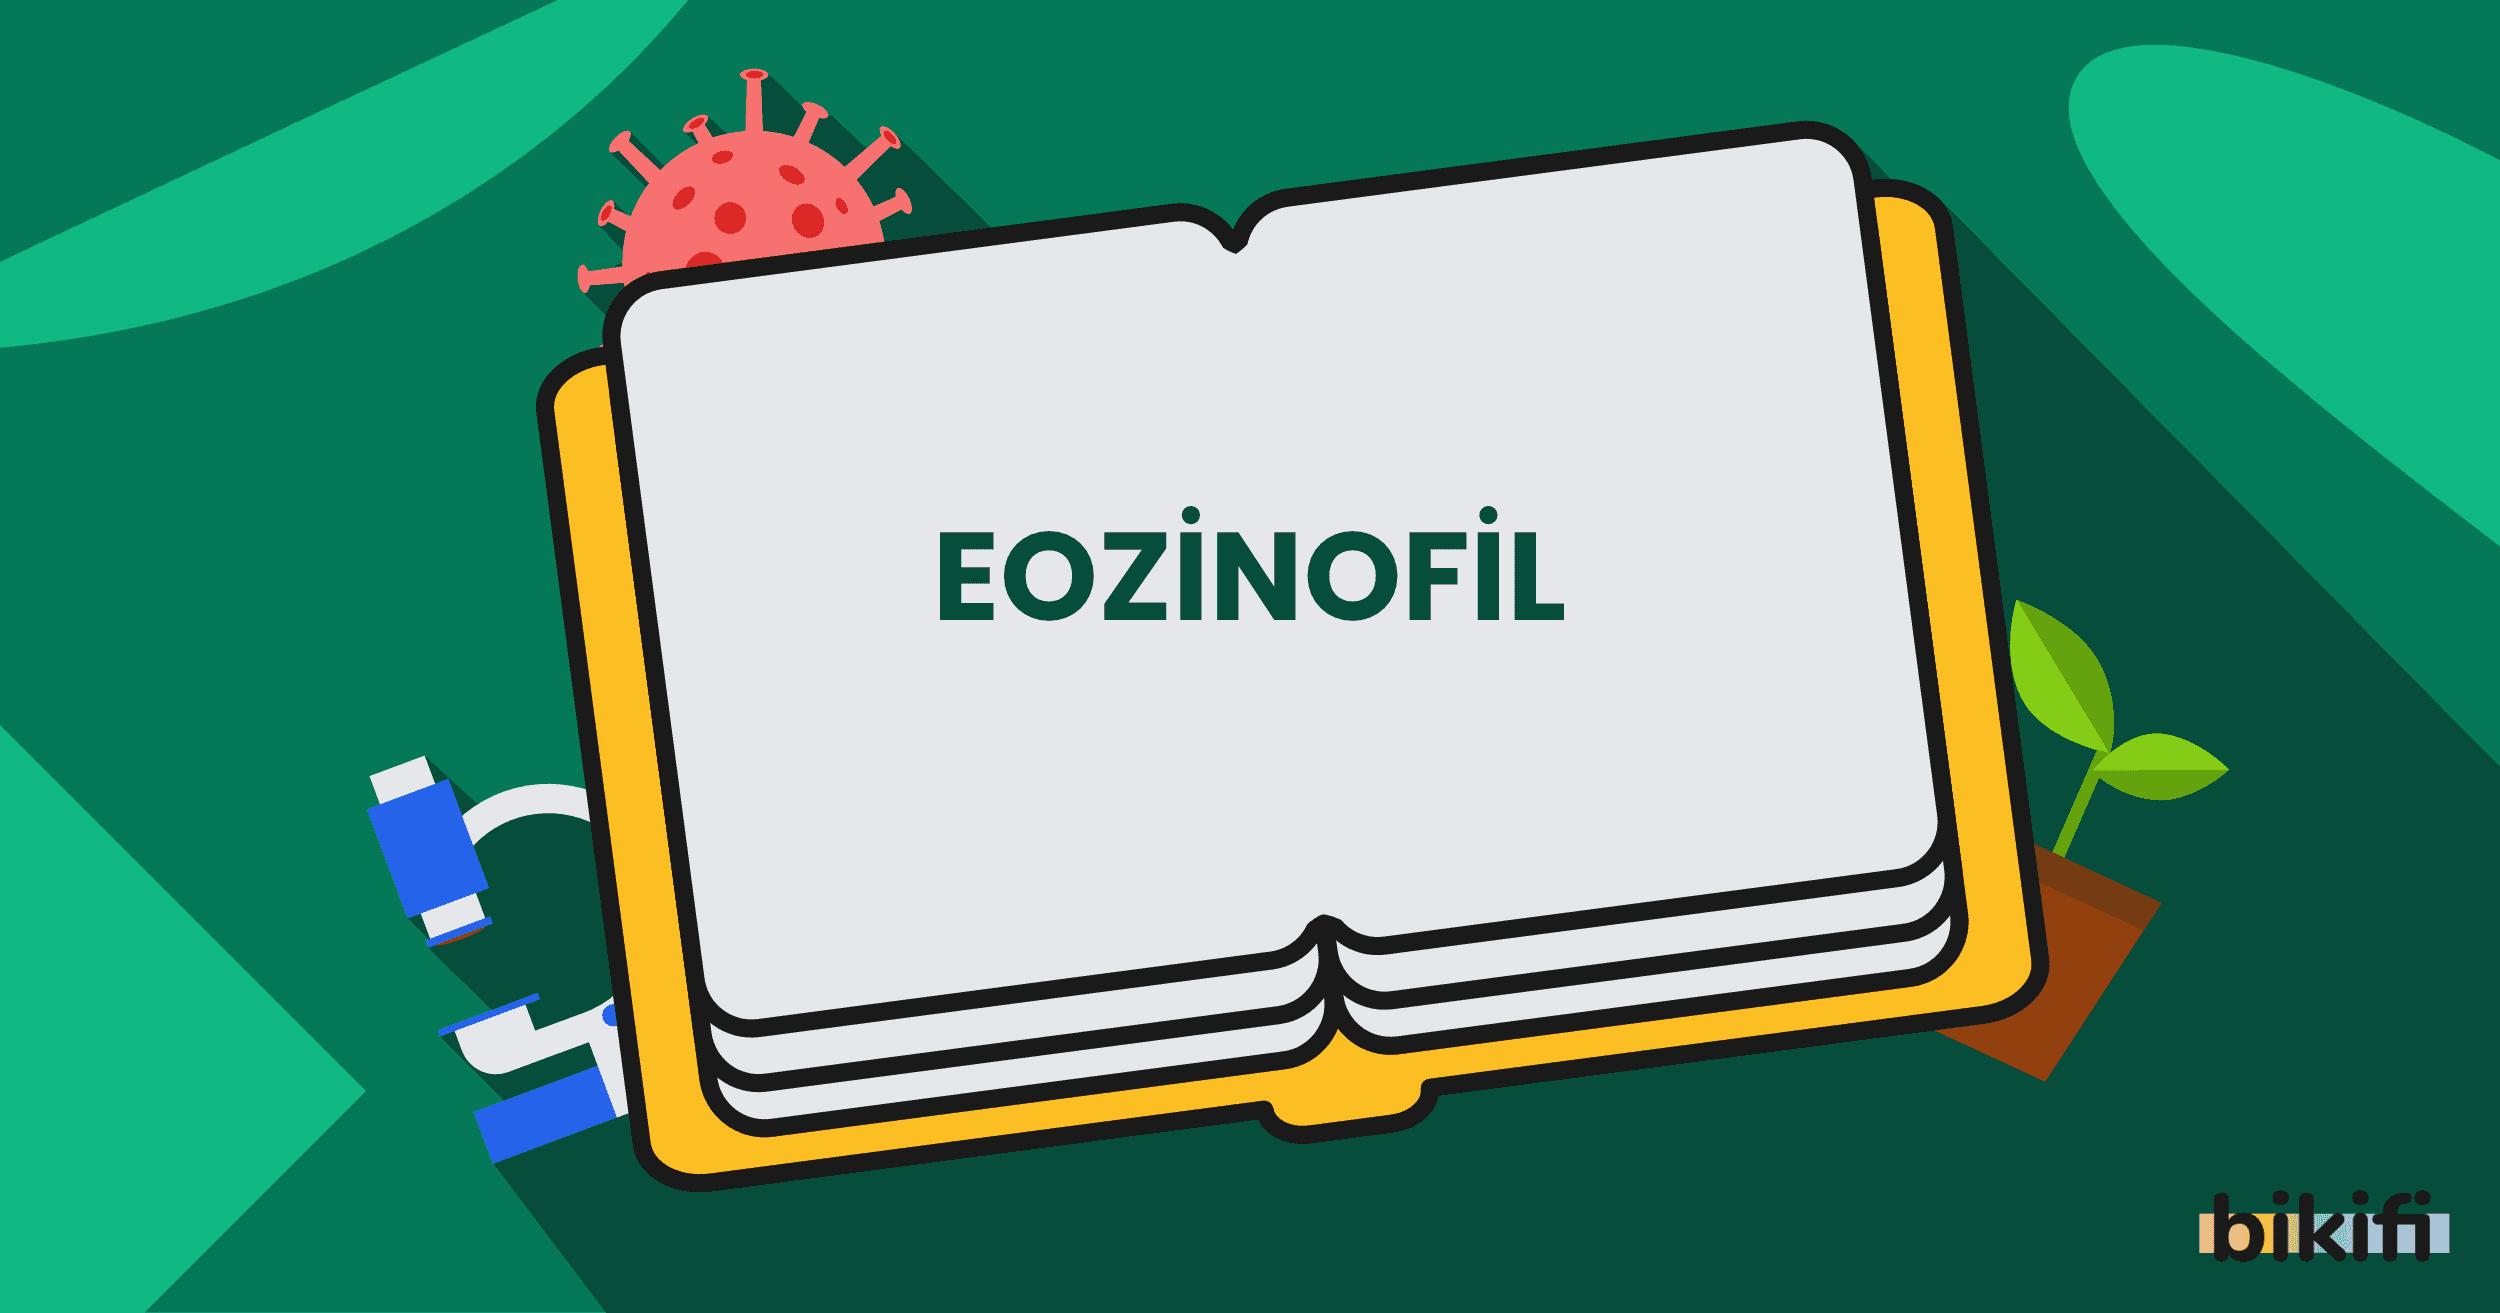 Eozinofil